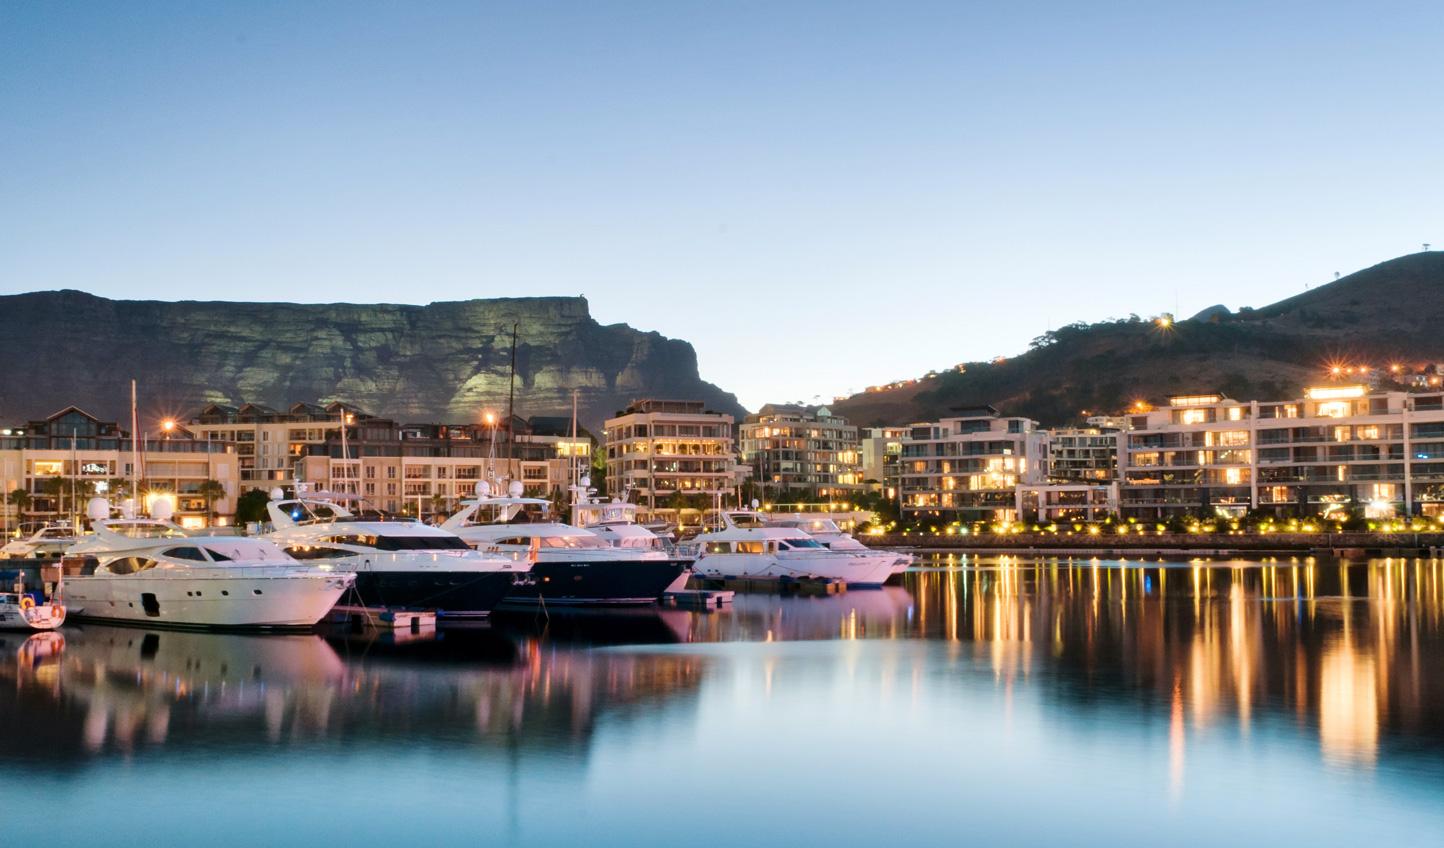 Take a stroll along the stylish V&A Waterfront